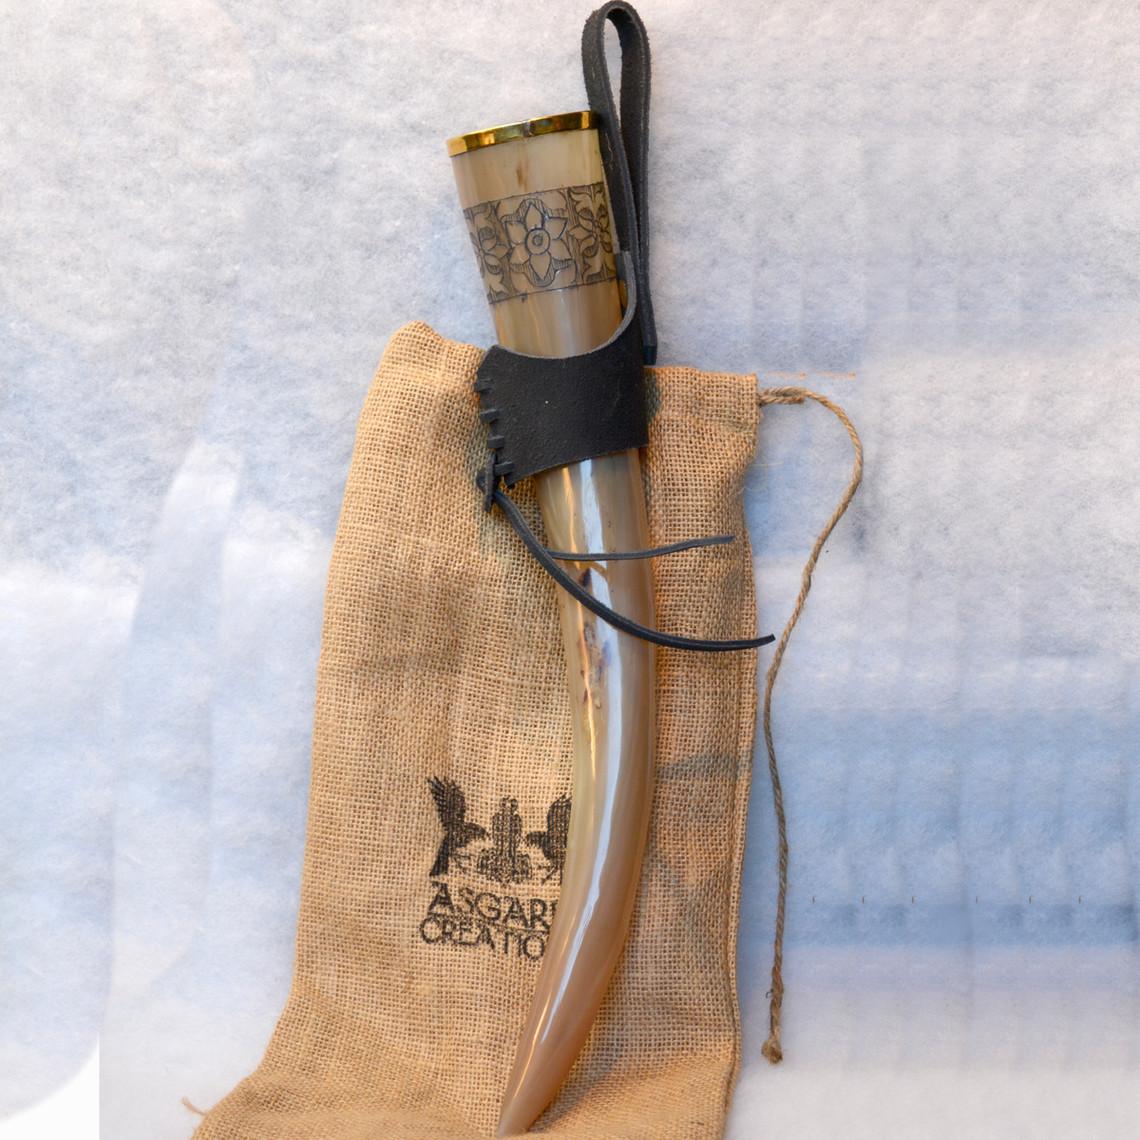 Windlass Steelcrafts Drikkehorn Freya med læderholder